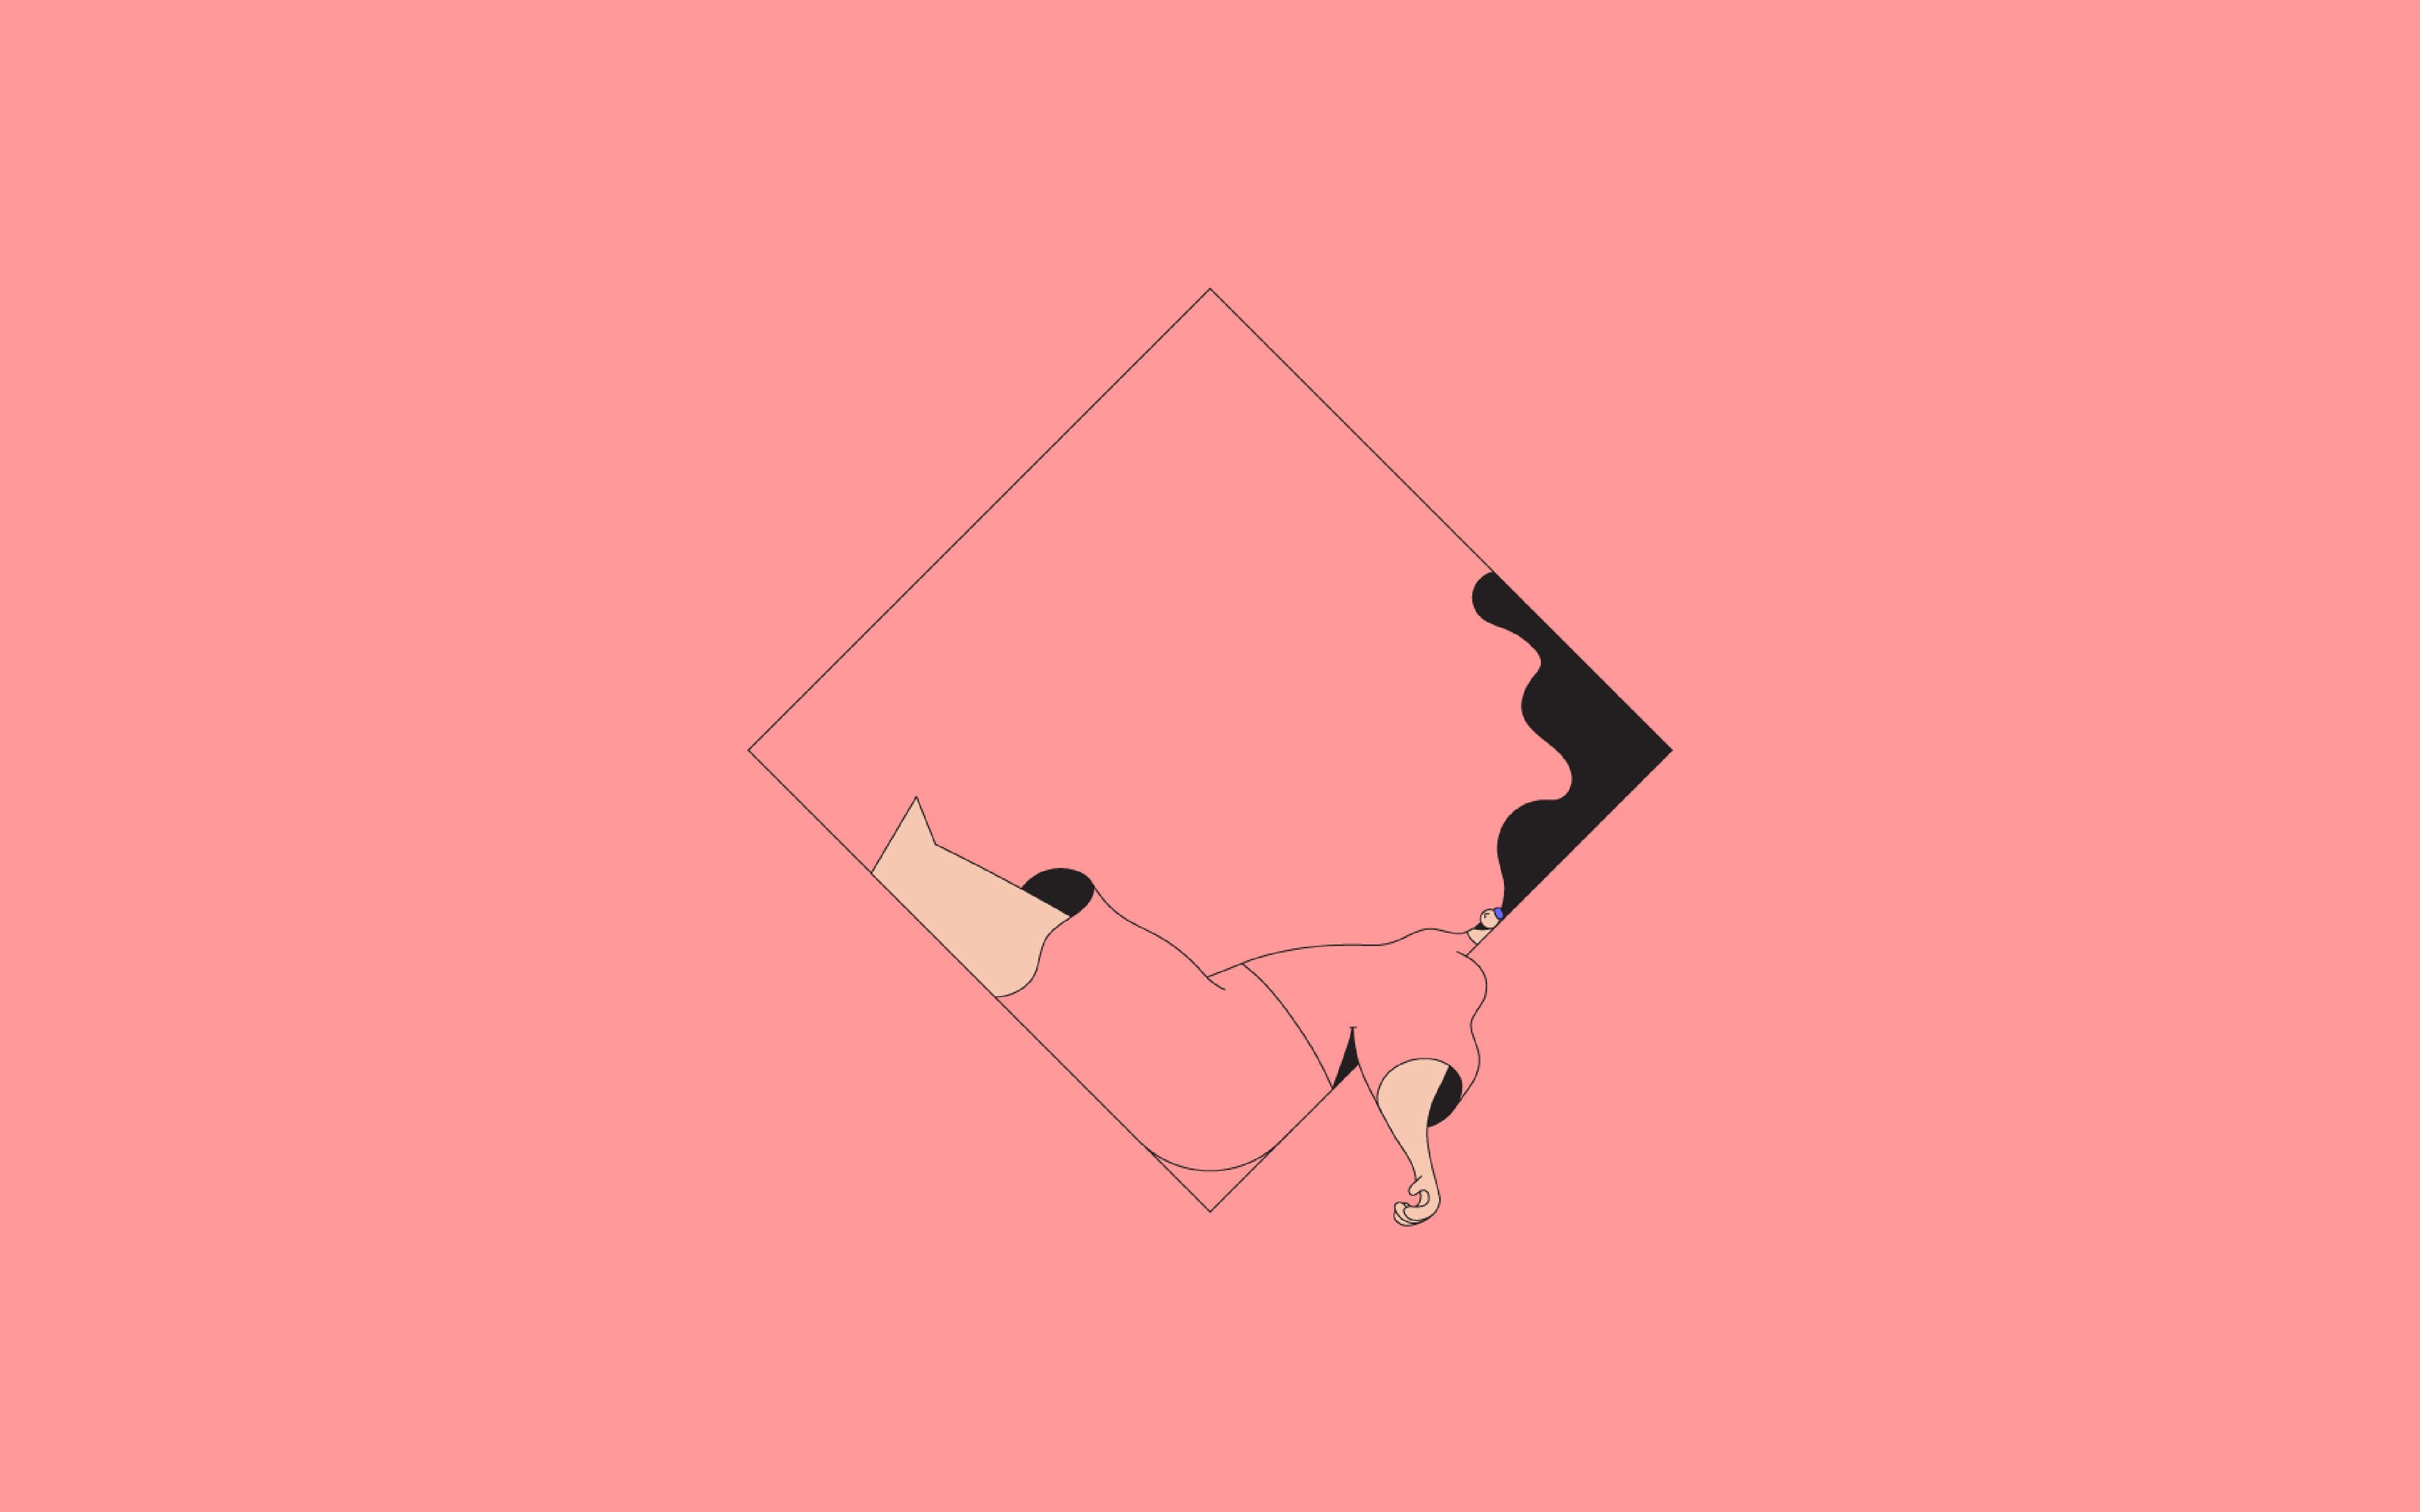 Bb08 minimal drawing pink illustration art for Minimal art essay